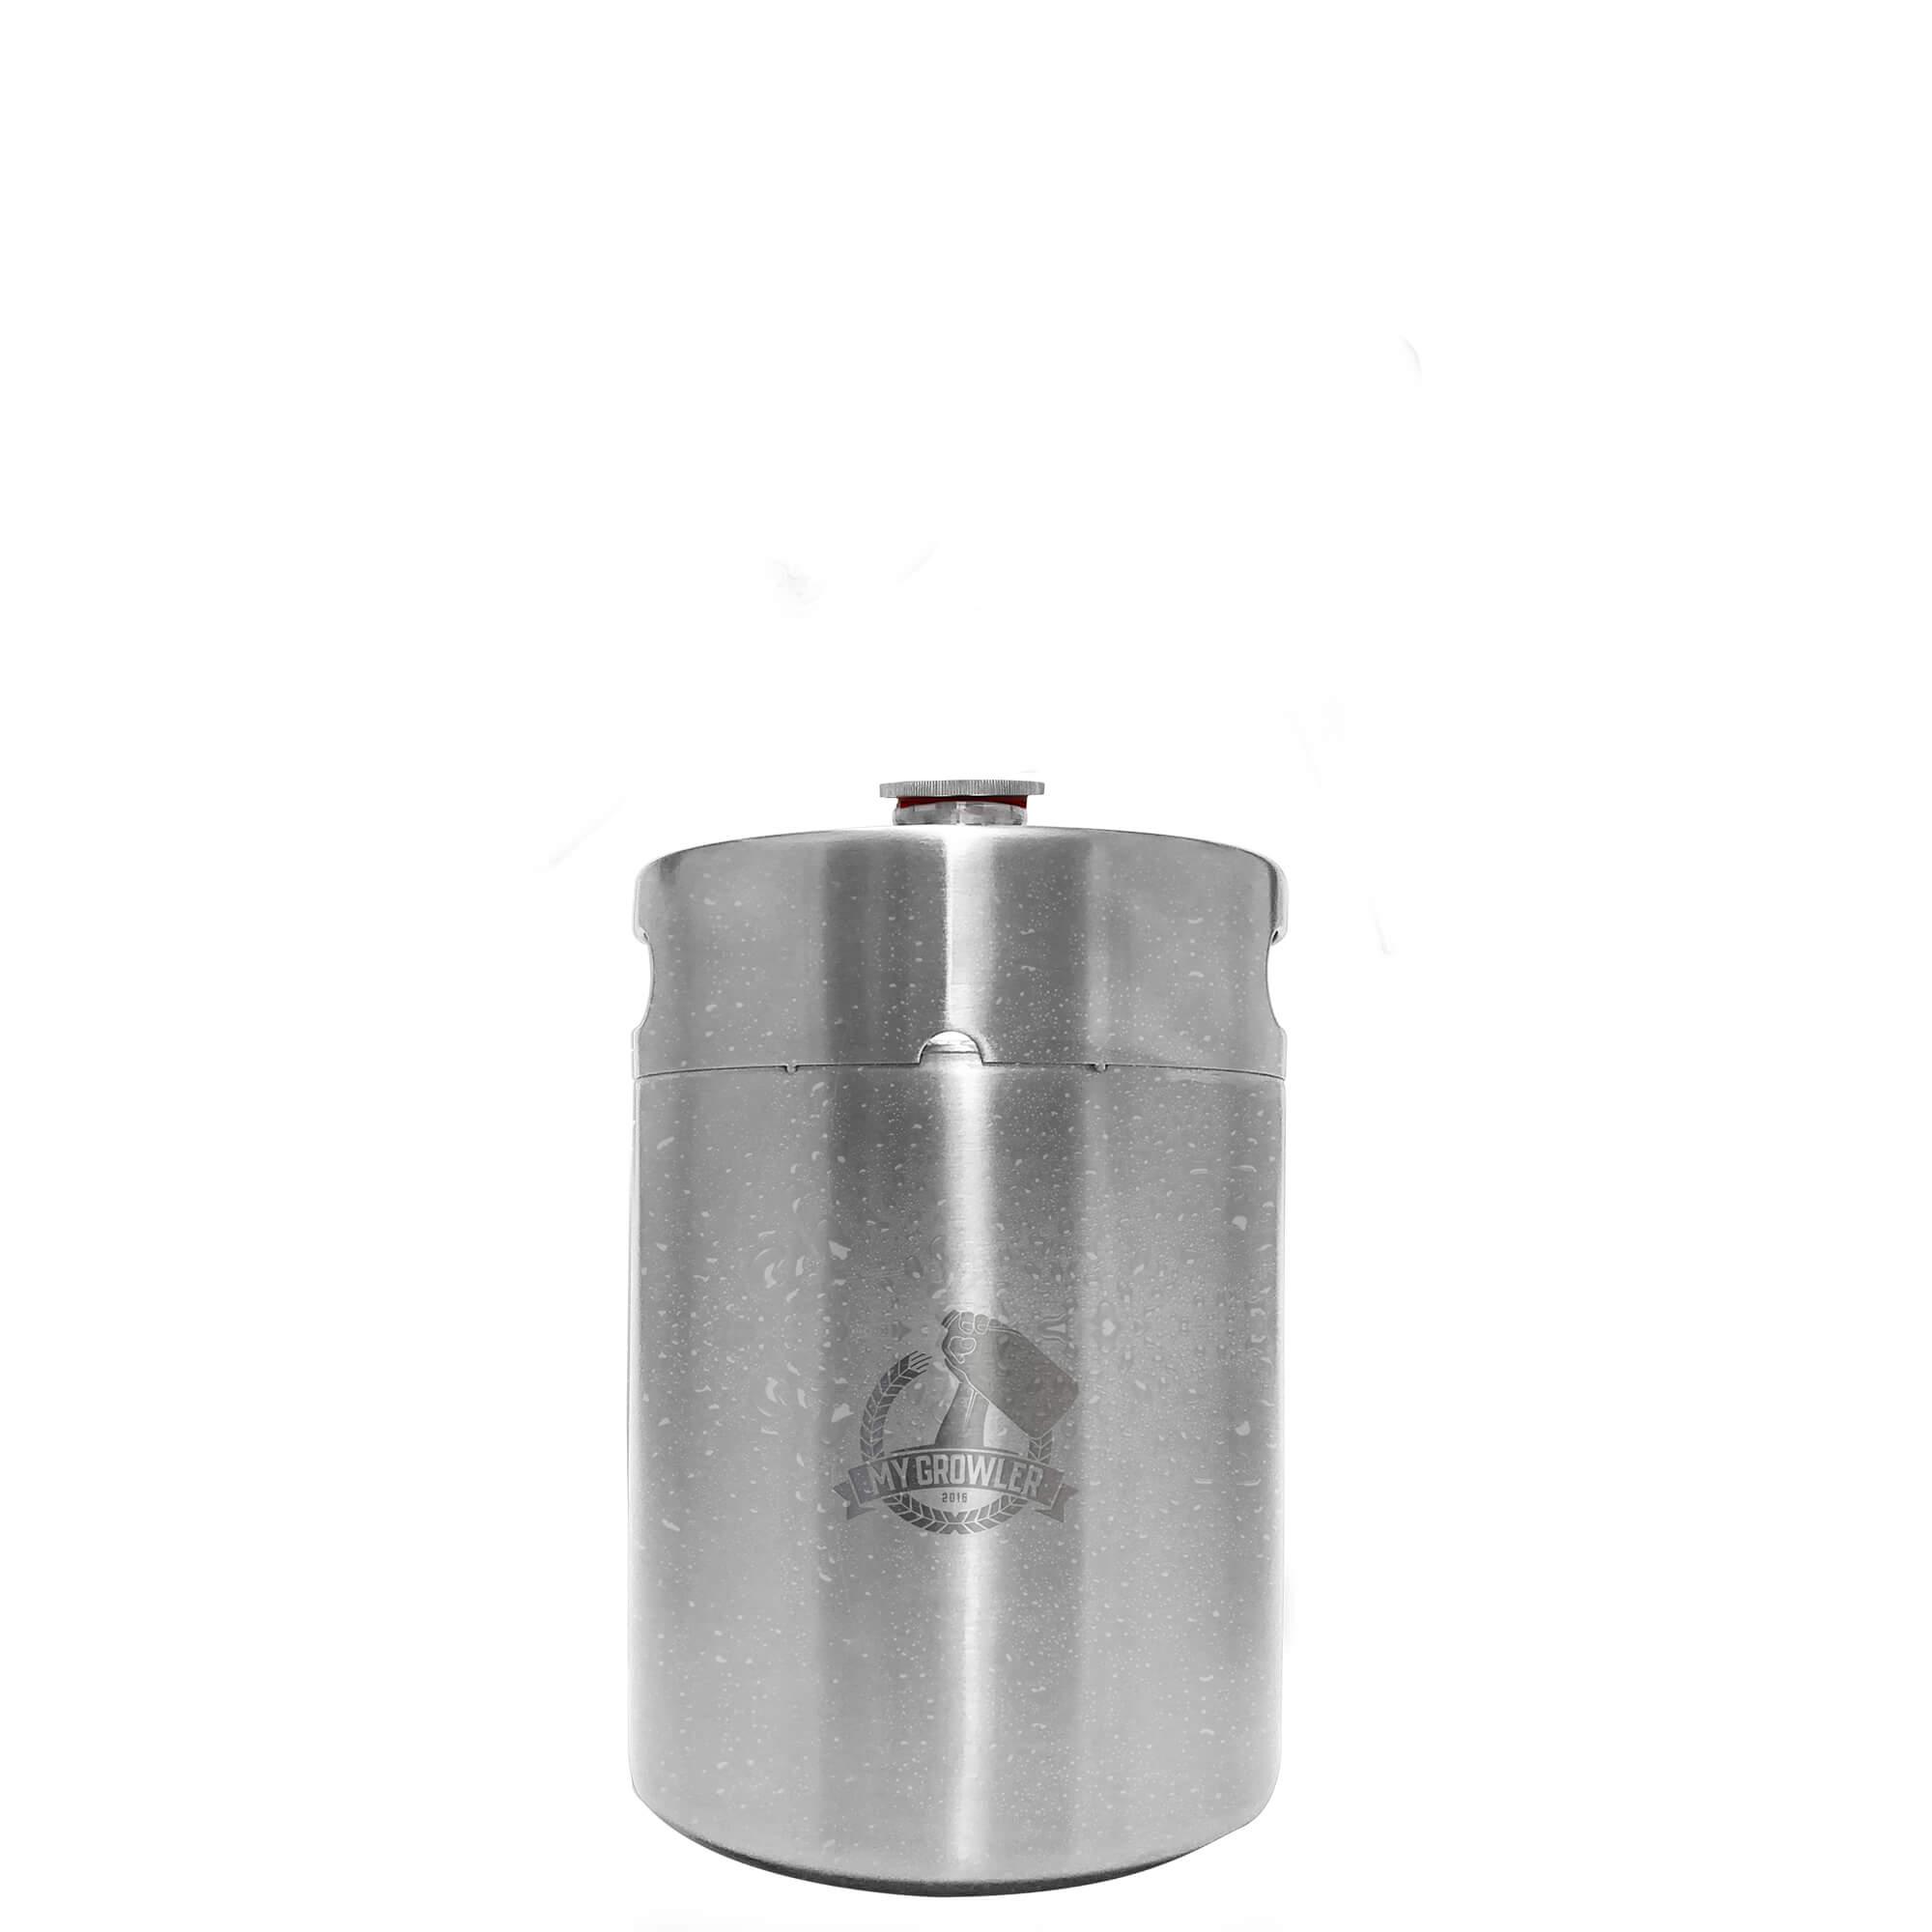 Mini Keg de aço inox 5L My Growler